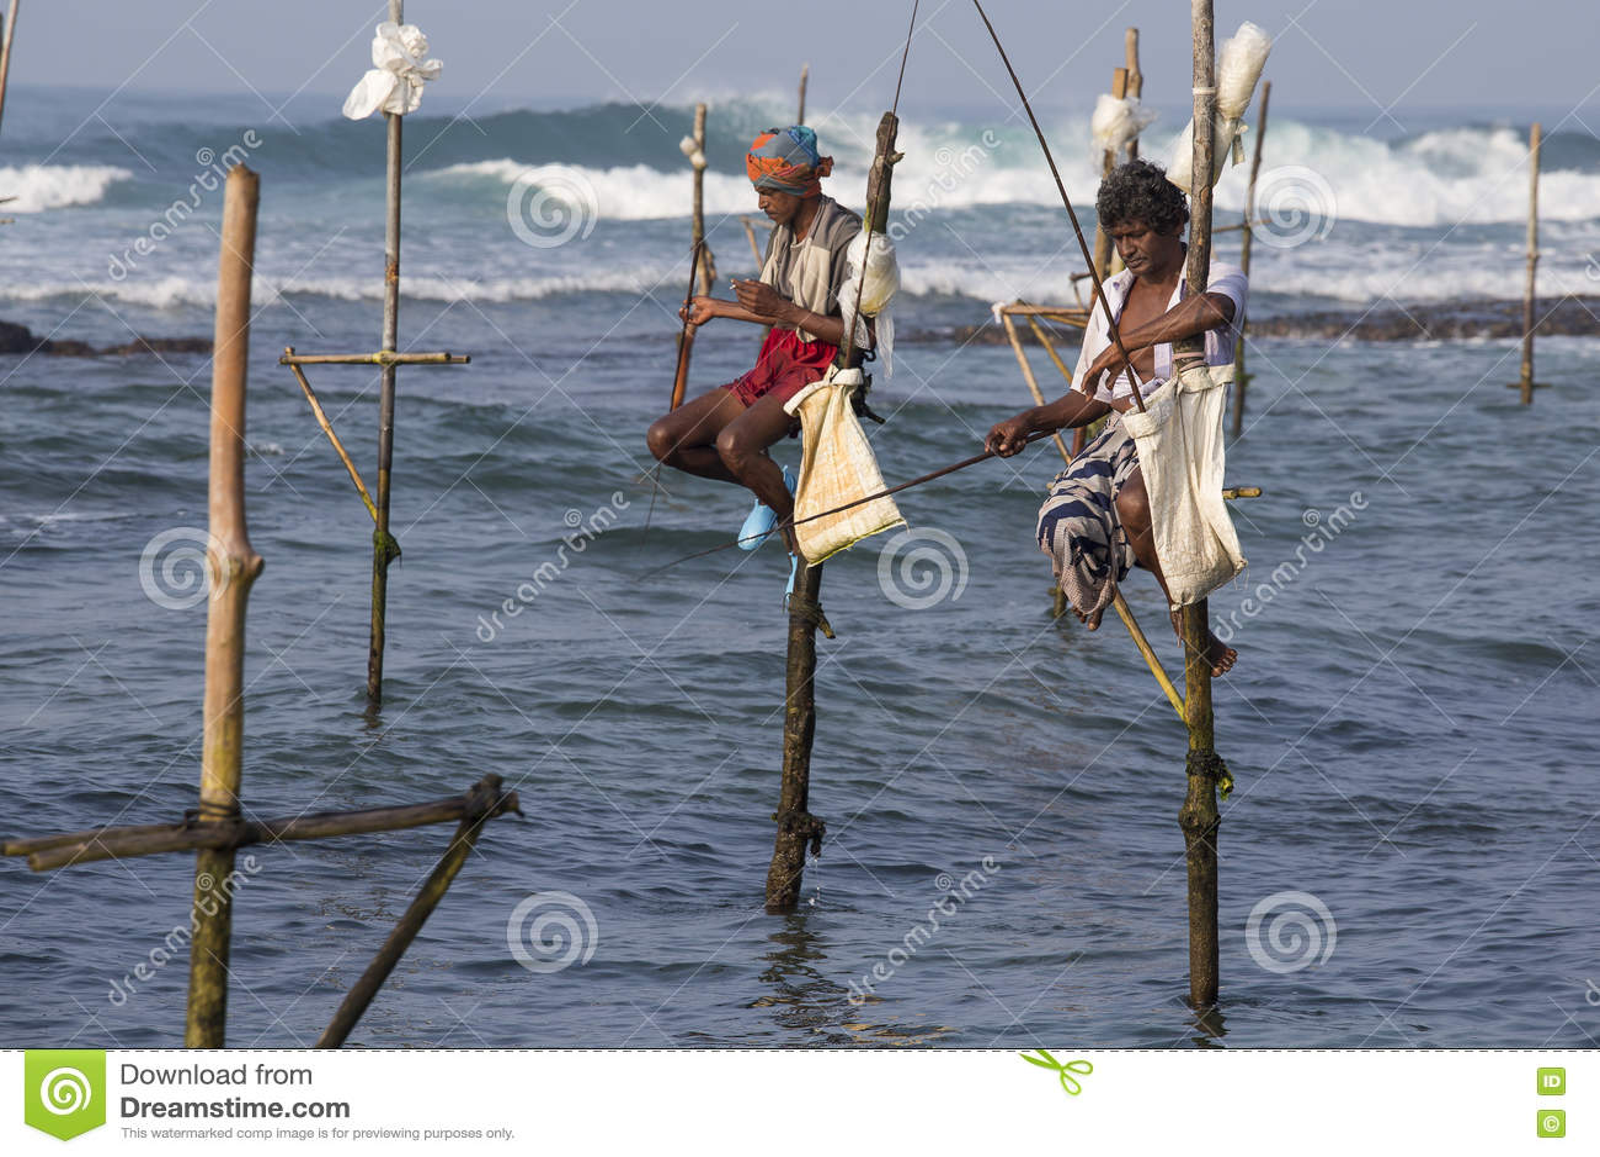 Local fishermen are fishing in sea water sri lanka for Sri lanka fishing